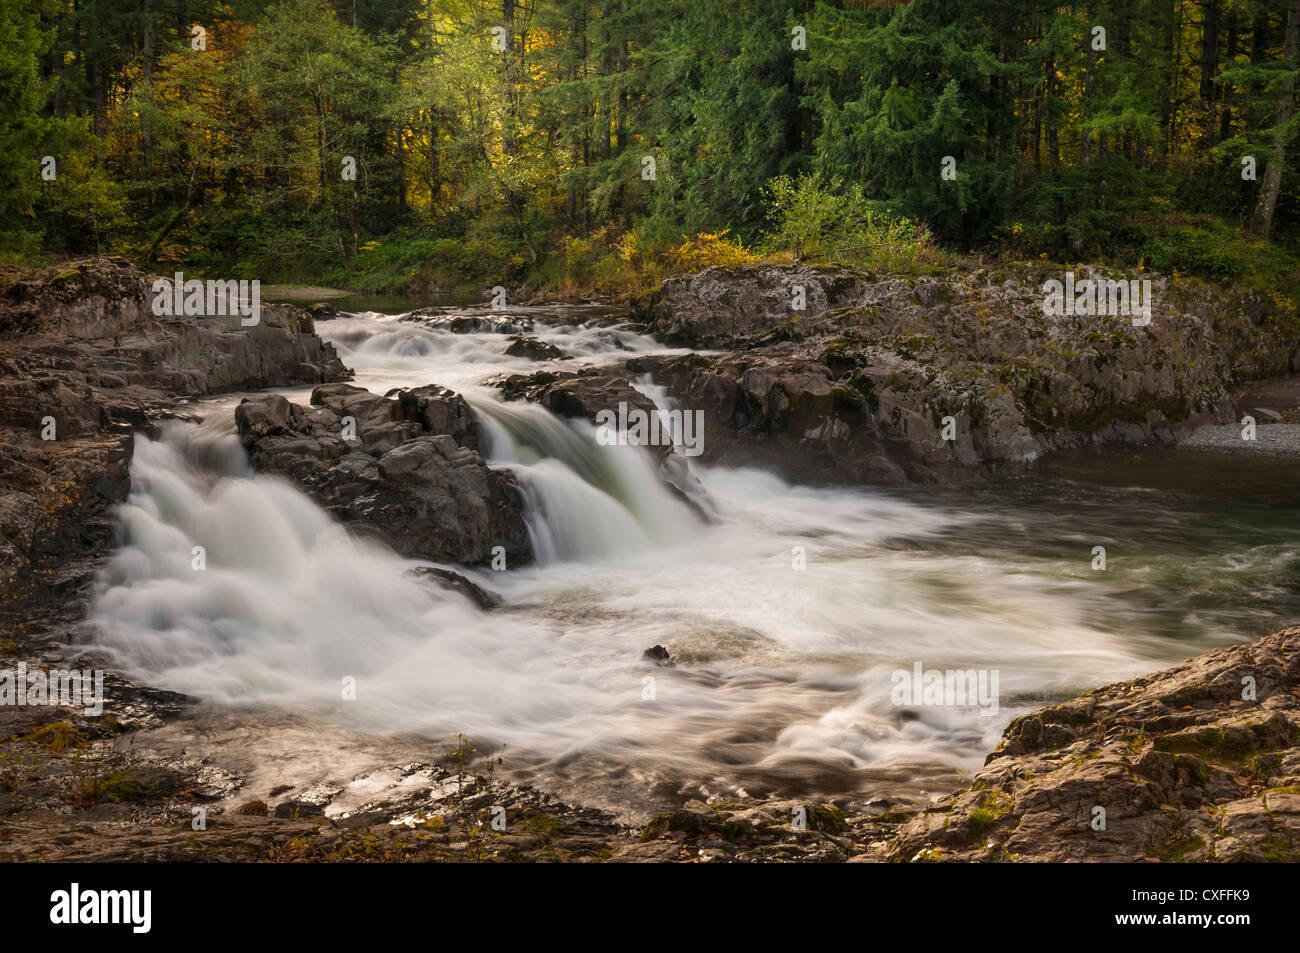 Lucia Falls, East Fork Lewis River, Clark County, Washington. - Stock Image